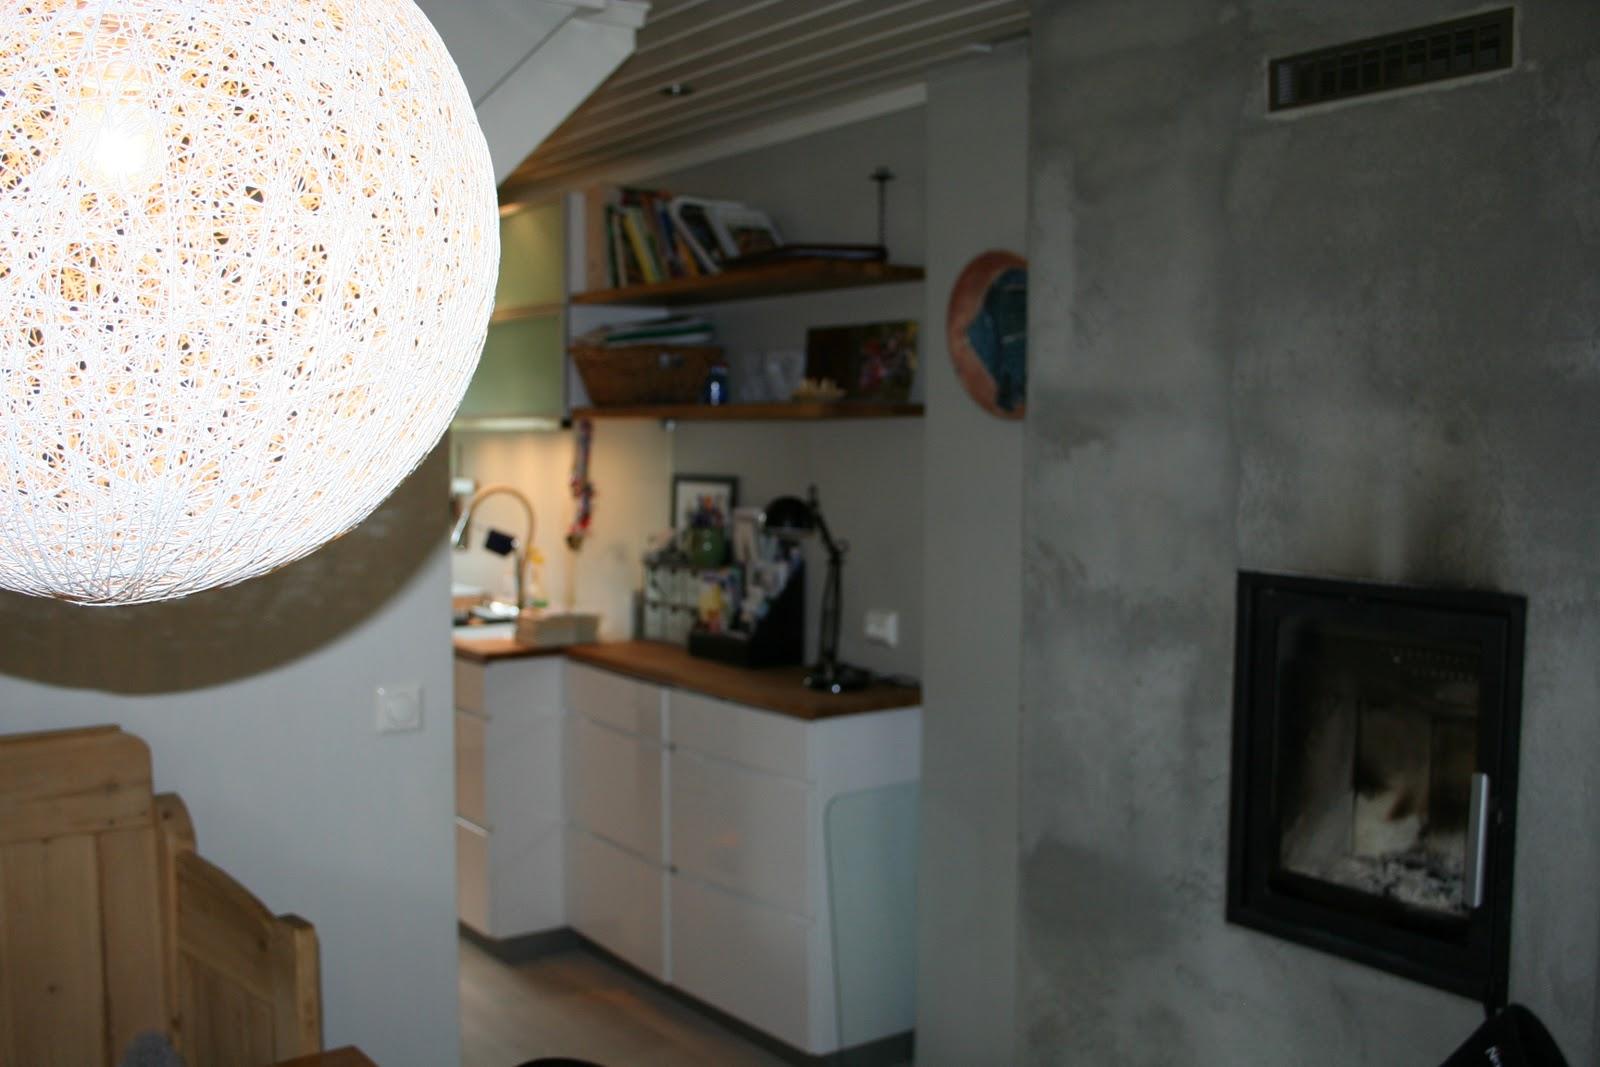 Elisabeth fougner arkitektur og interiørdesign: oktober 2011